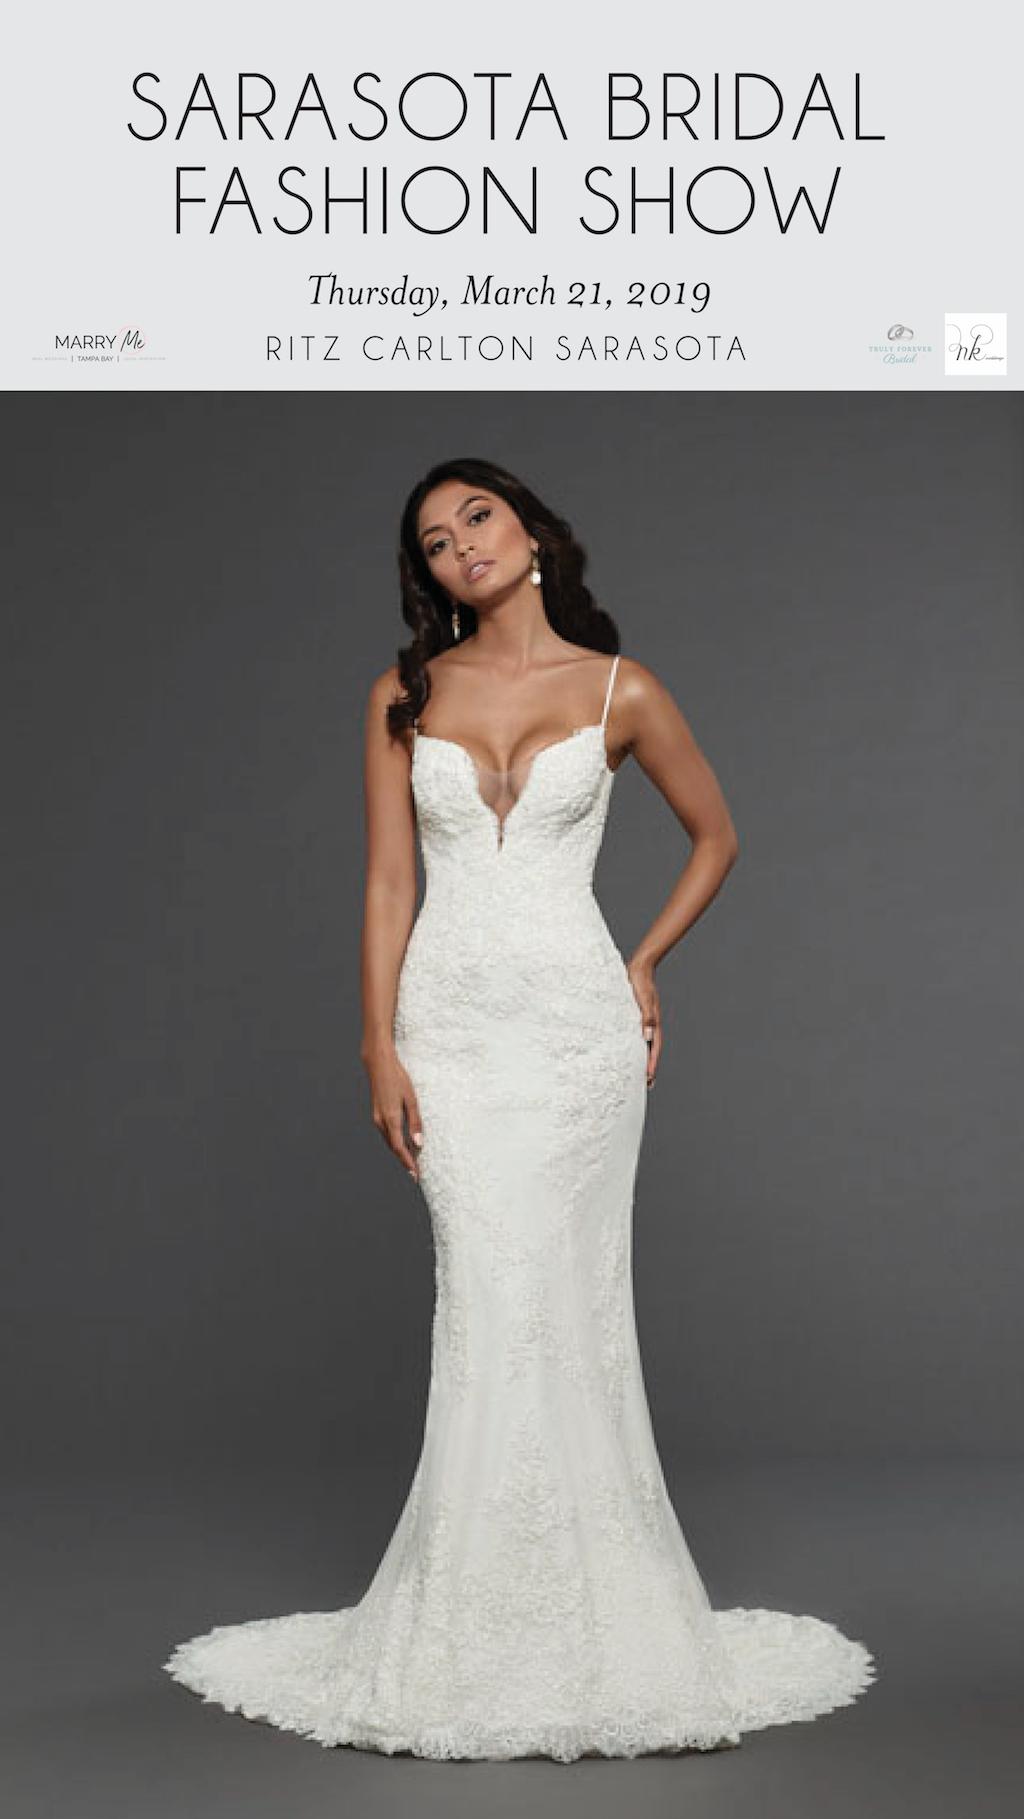 fa77b4e7c438 Wedding Dress Fashion Show – DACC